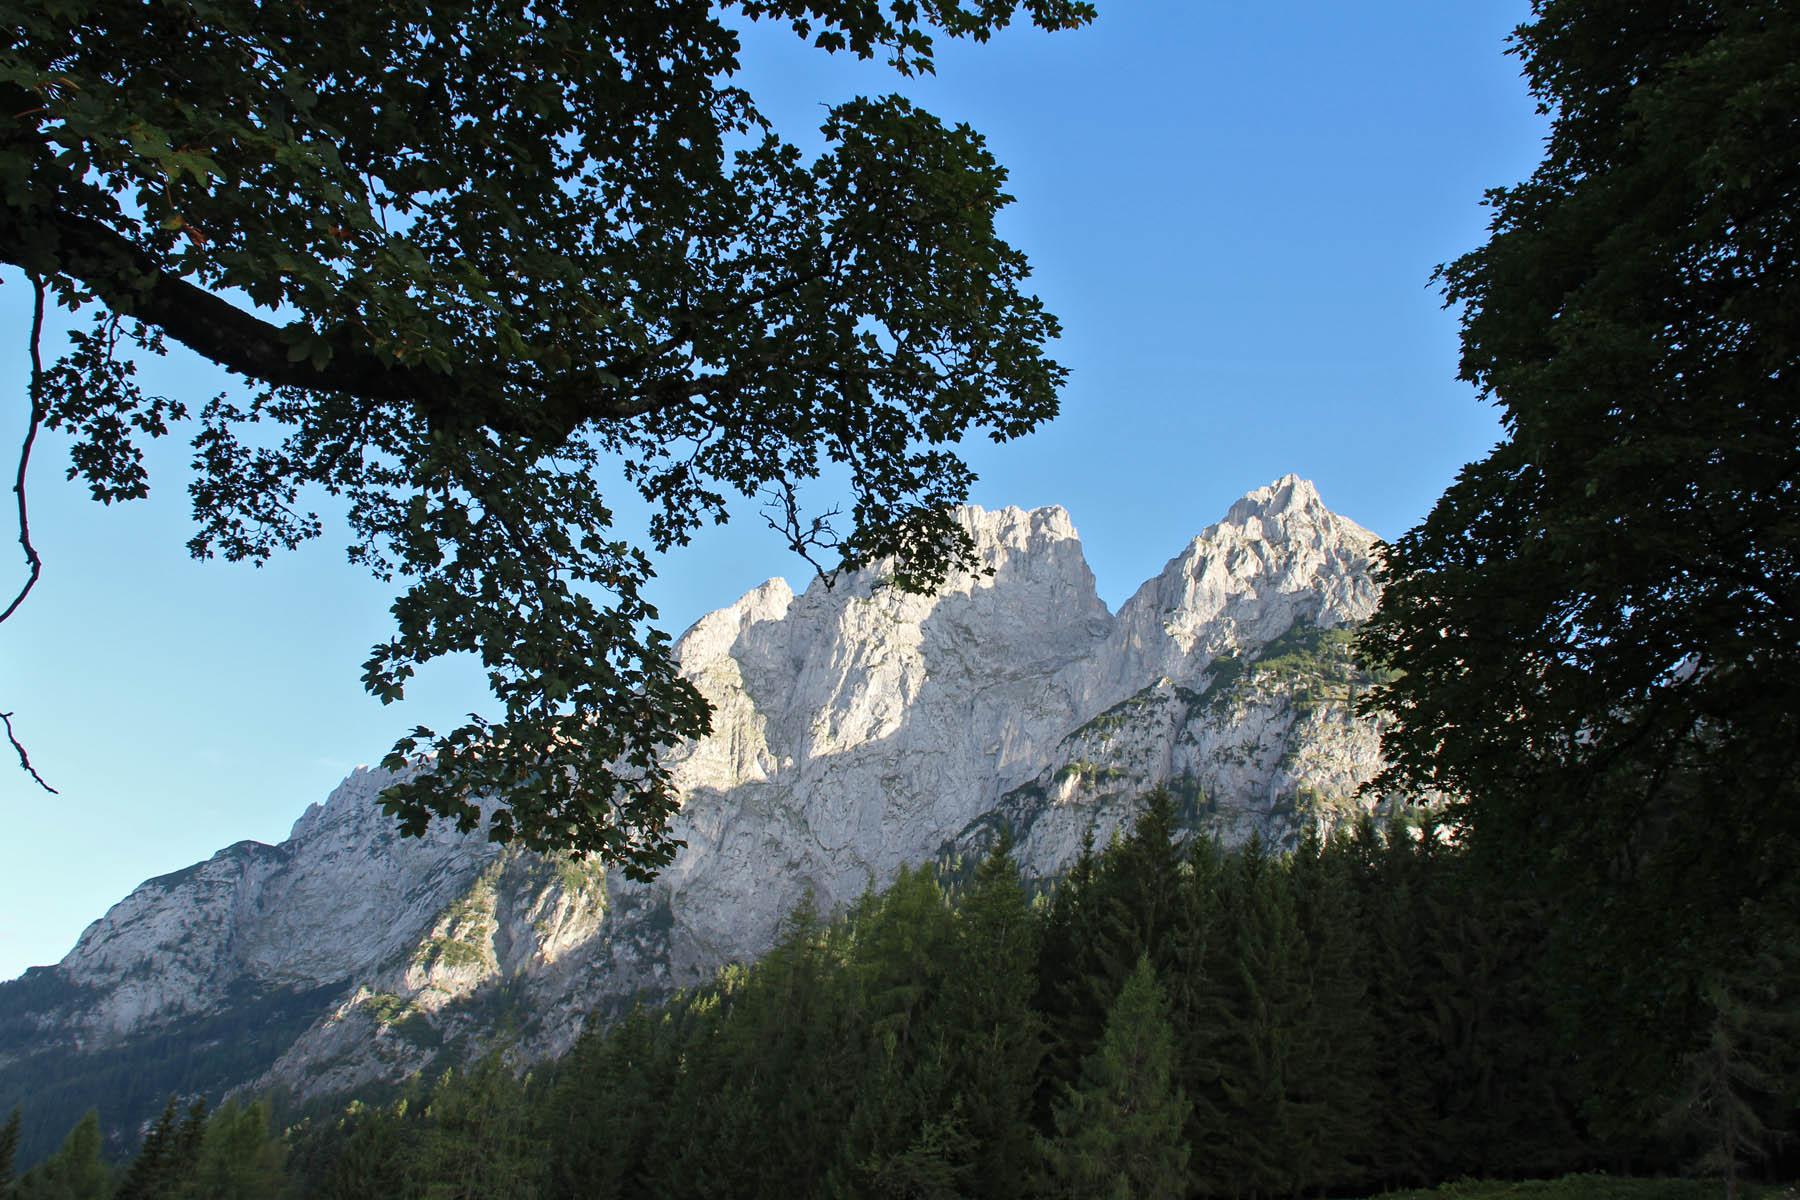 Das Tennengebirge bei der Mahdegg Alm